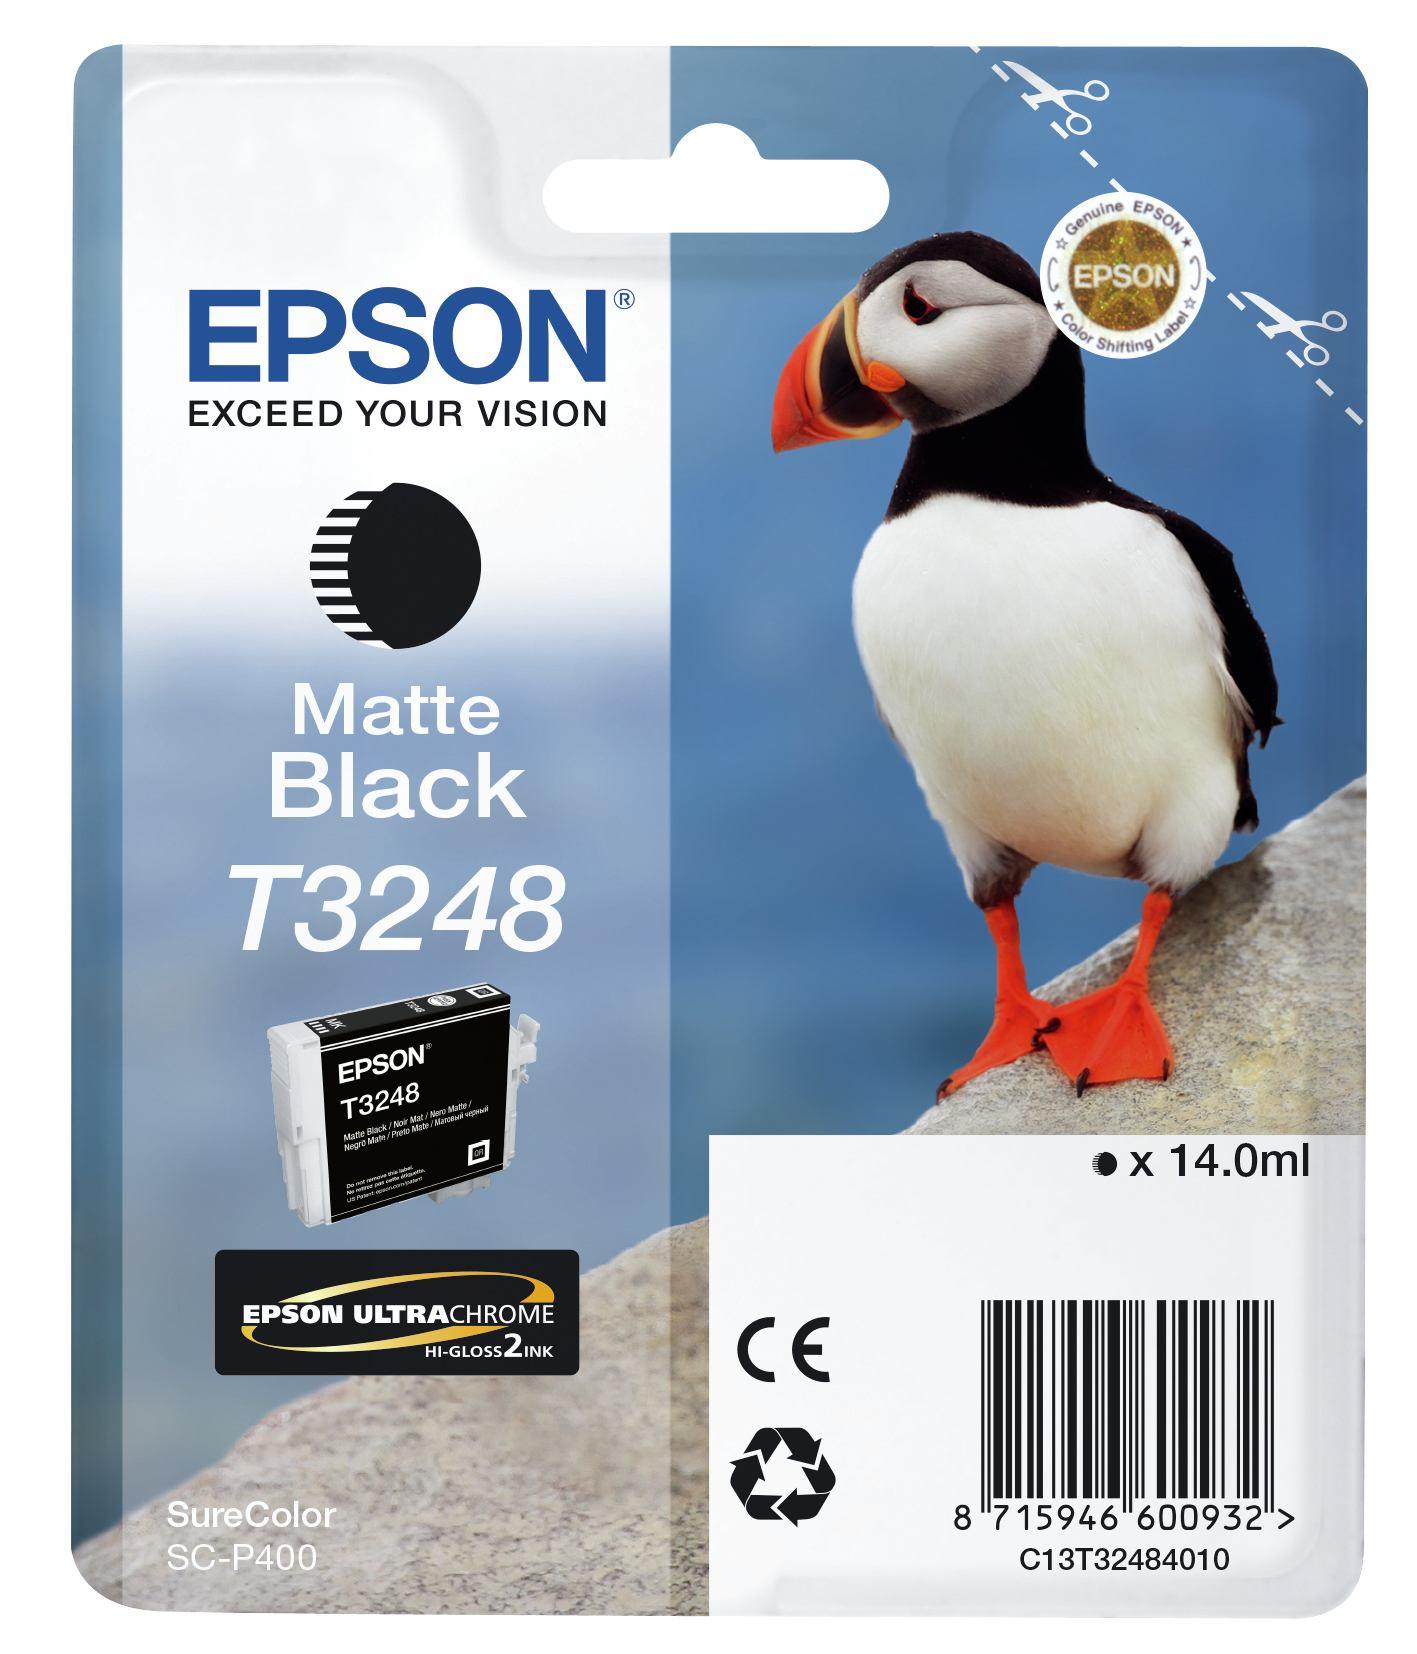 2044458-e-T3248-Matte-Black-HI-GLOSS2-T3248-PUFFIN-SINGLEPACK-1X14-0ML-BLACK